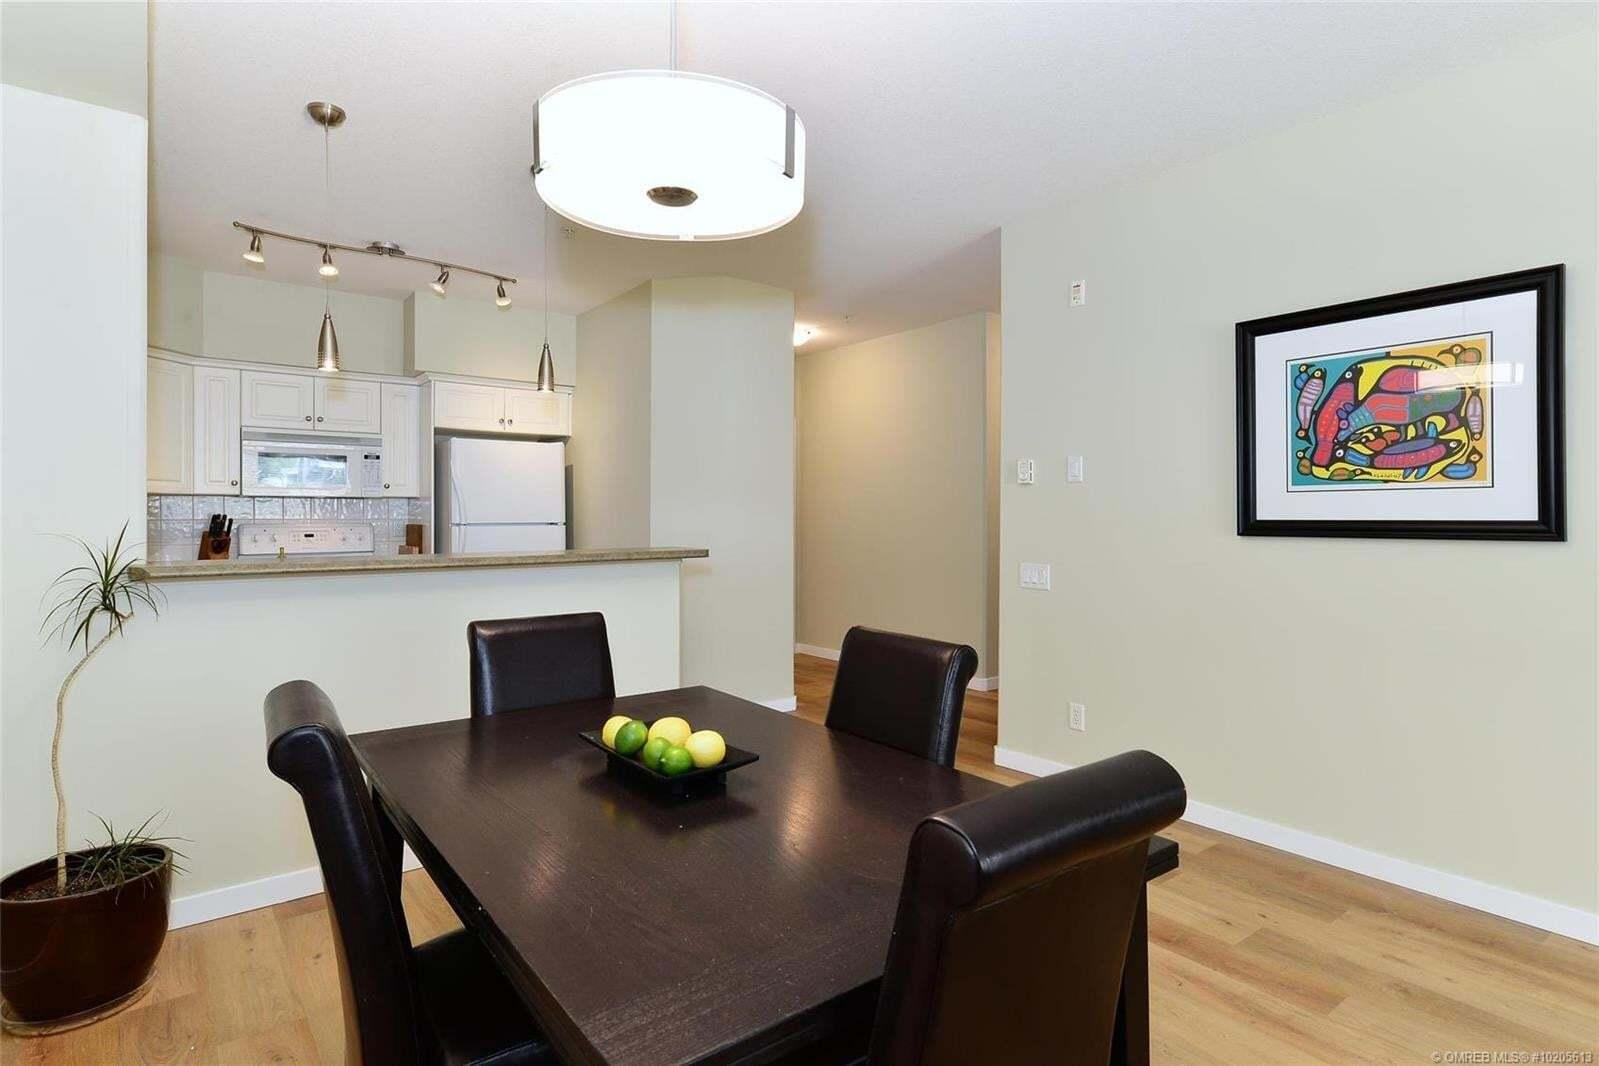 Condo for sale at 680 Lequime Rd Kelowna British Columbia - MLS: 10205613